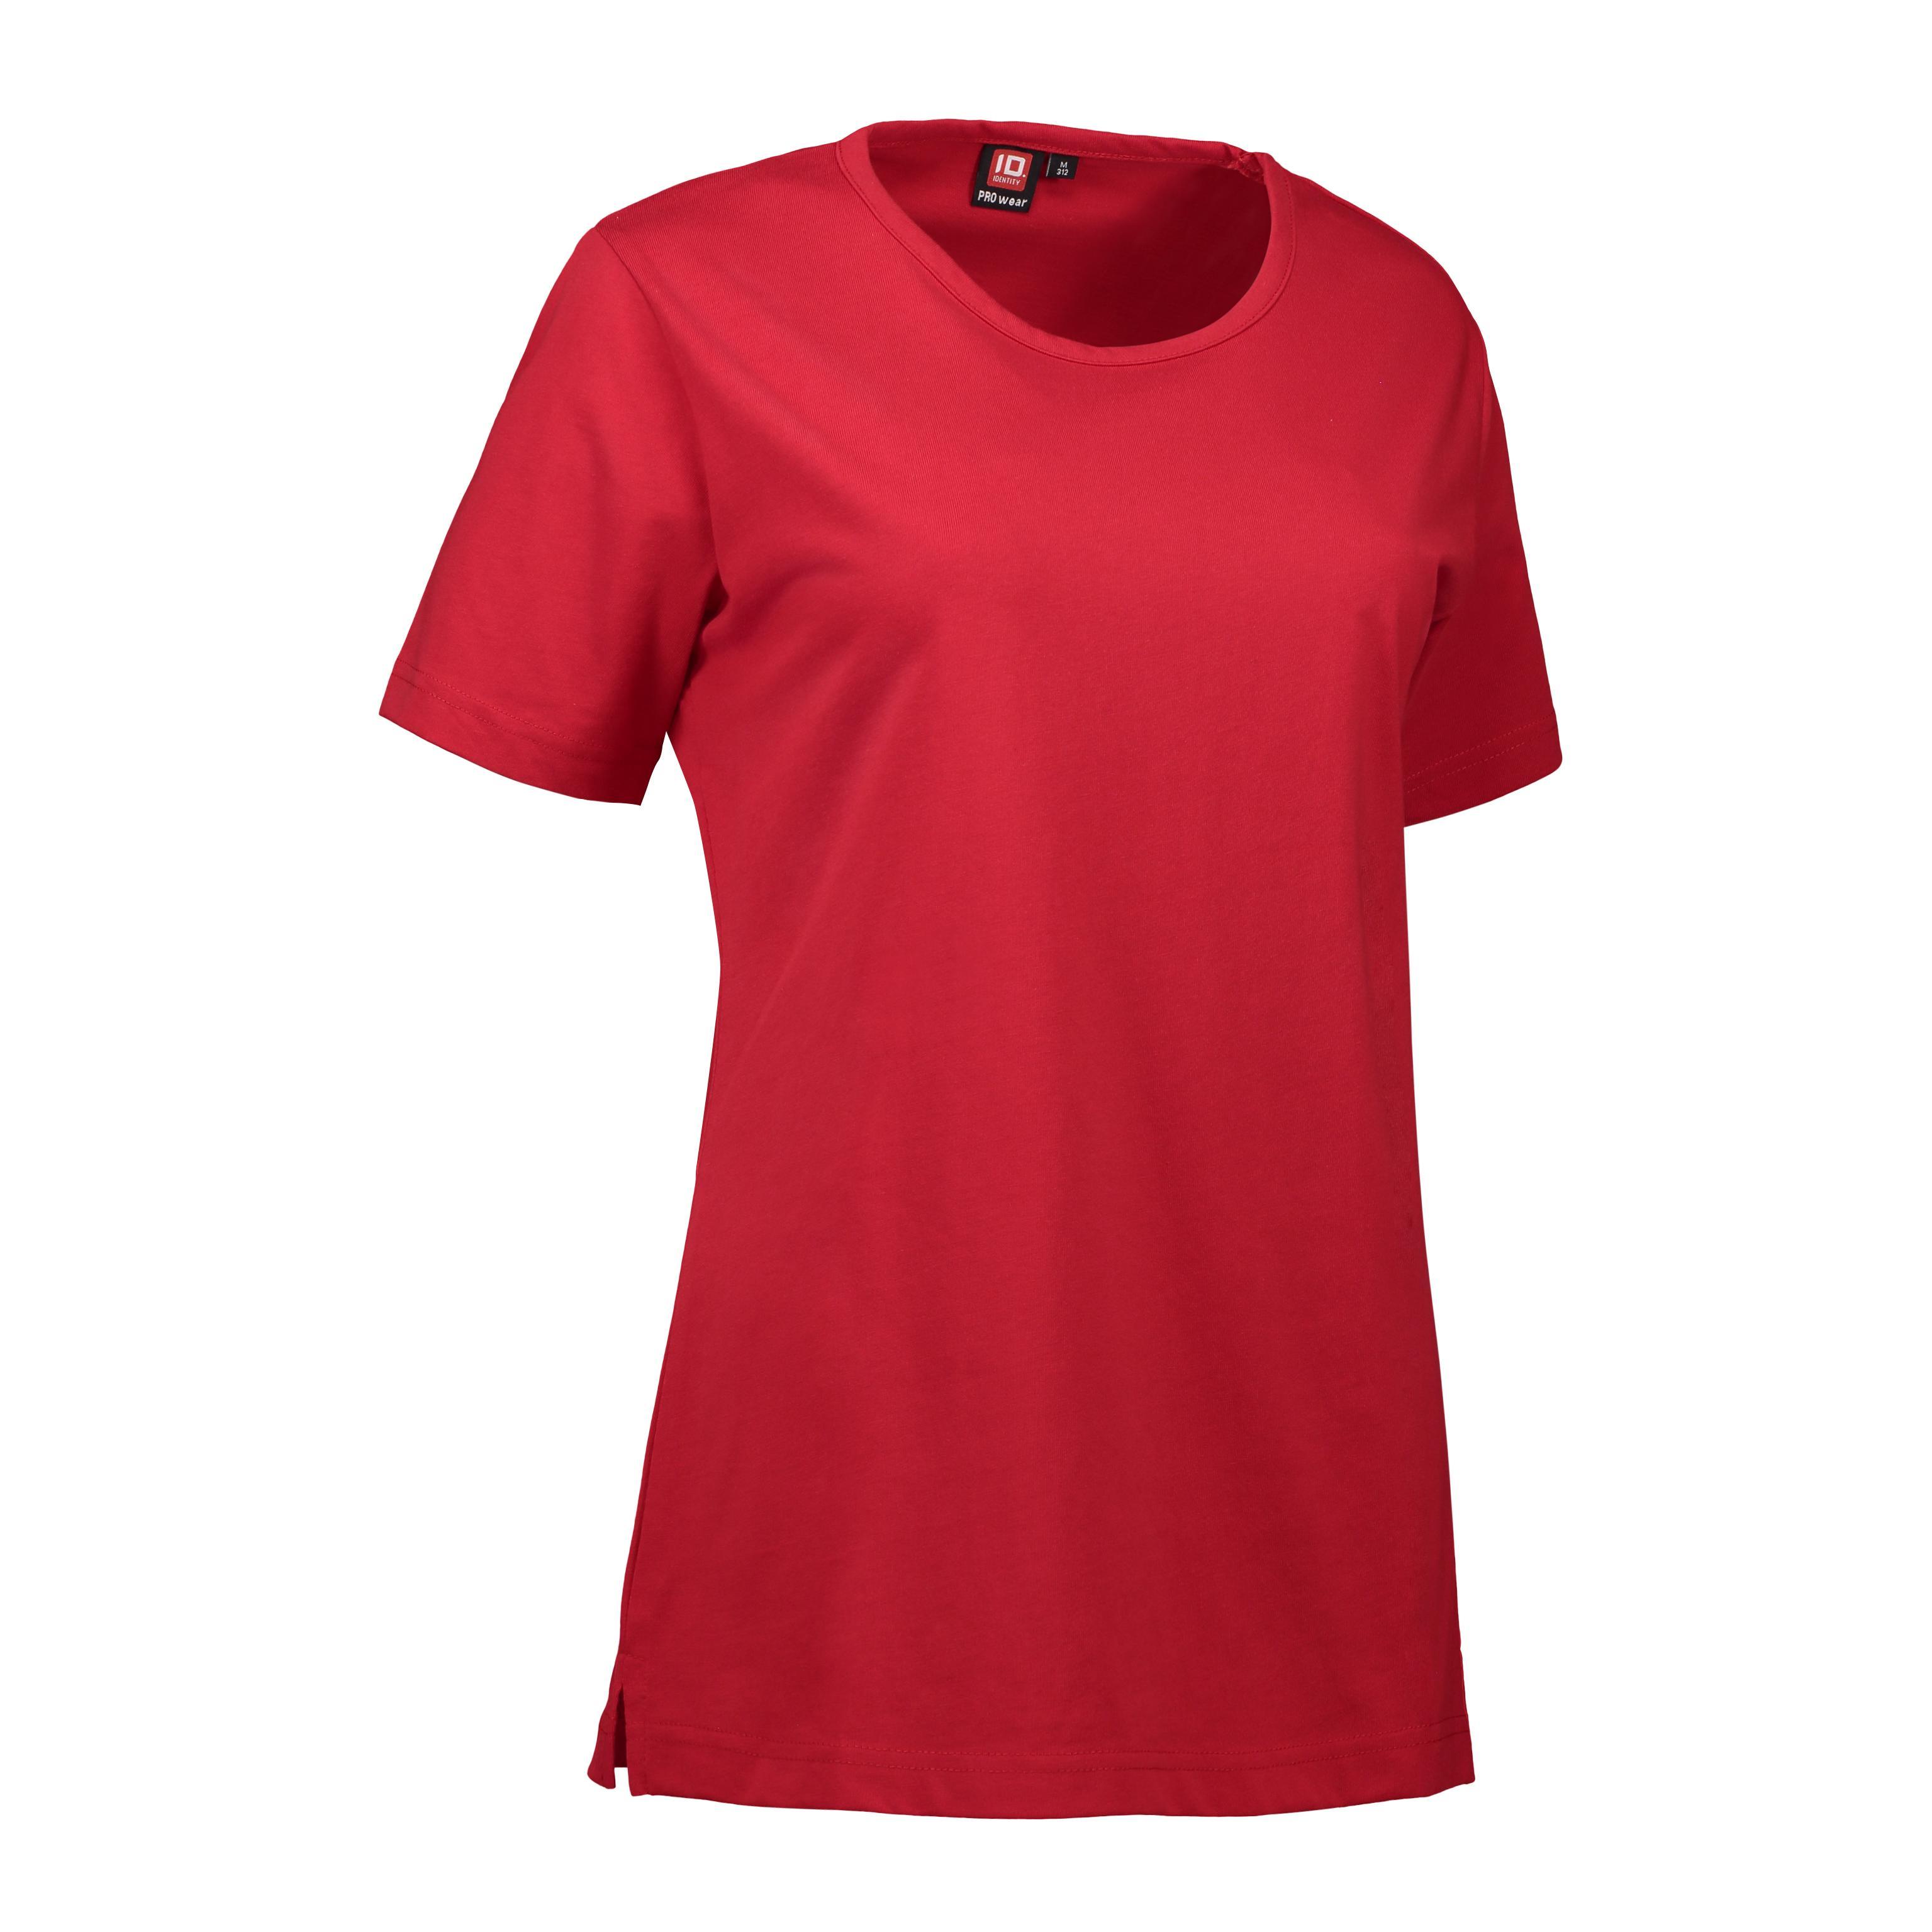 ID PRO Wear dame T shirt 0312